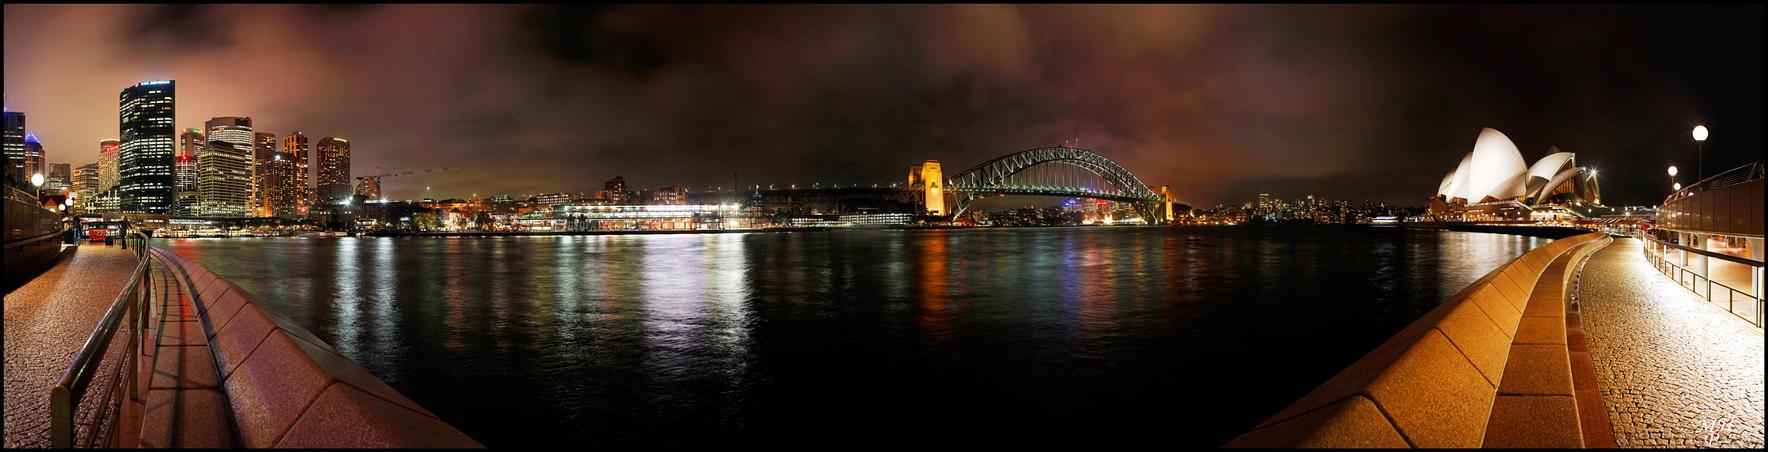 Sydney Harbour by MarkHumphreys